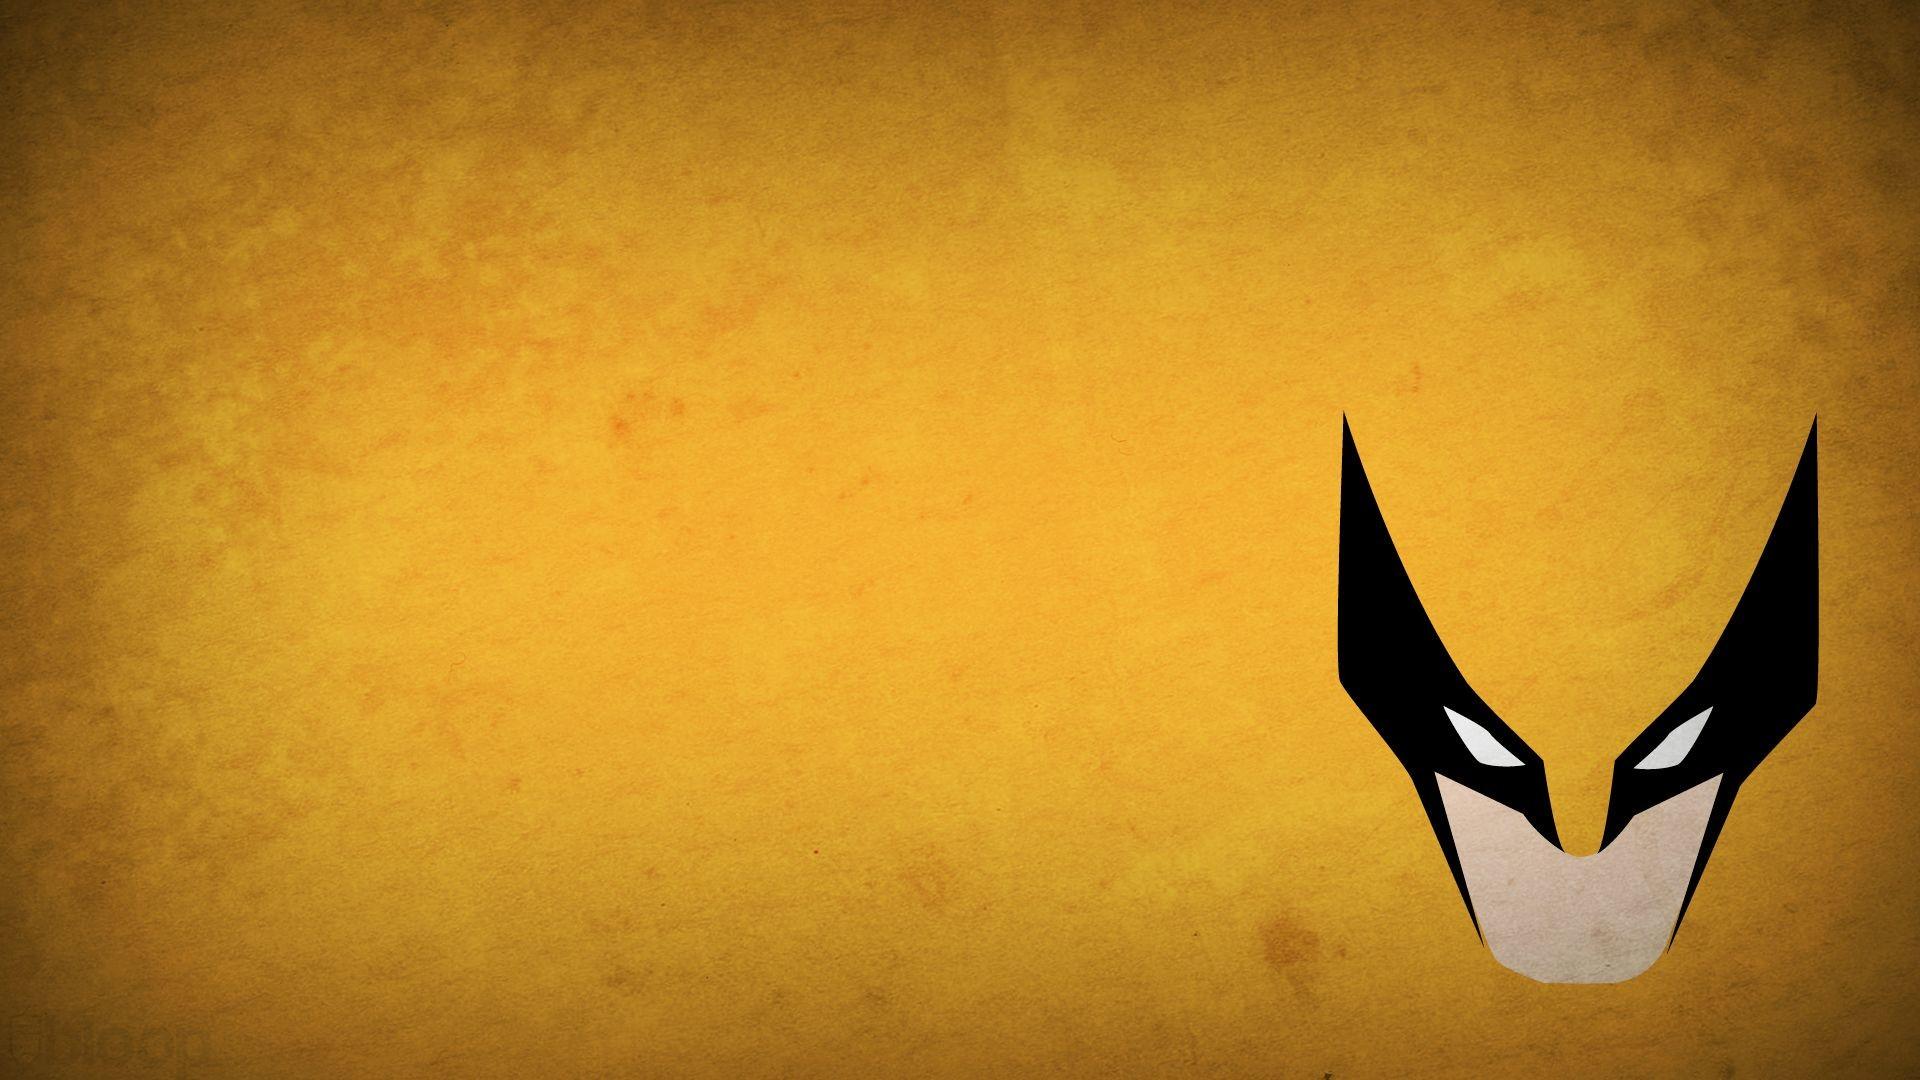 Wolverine Wallpapers Wolverine Pinterest Marvel dc 1920×1200 Wolverine  Wallpaper (46 Wallpapers) |